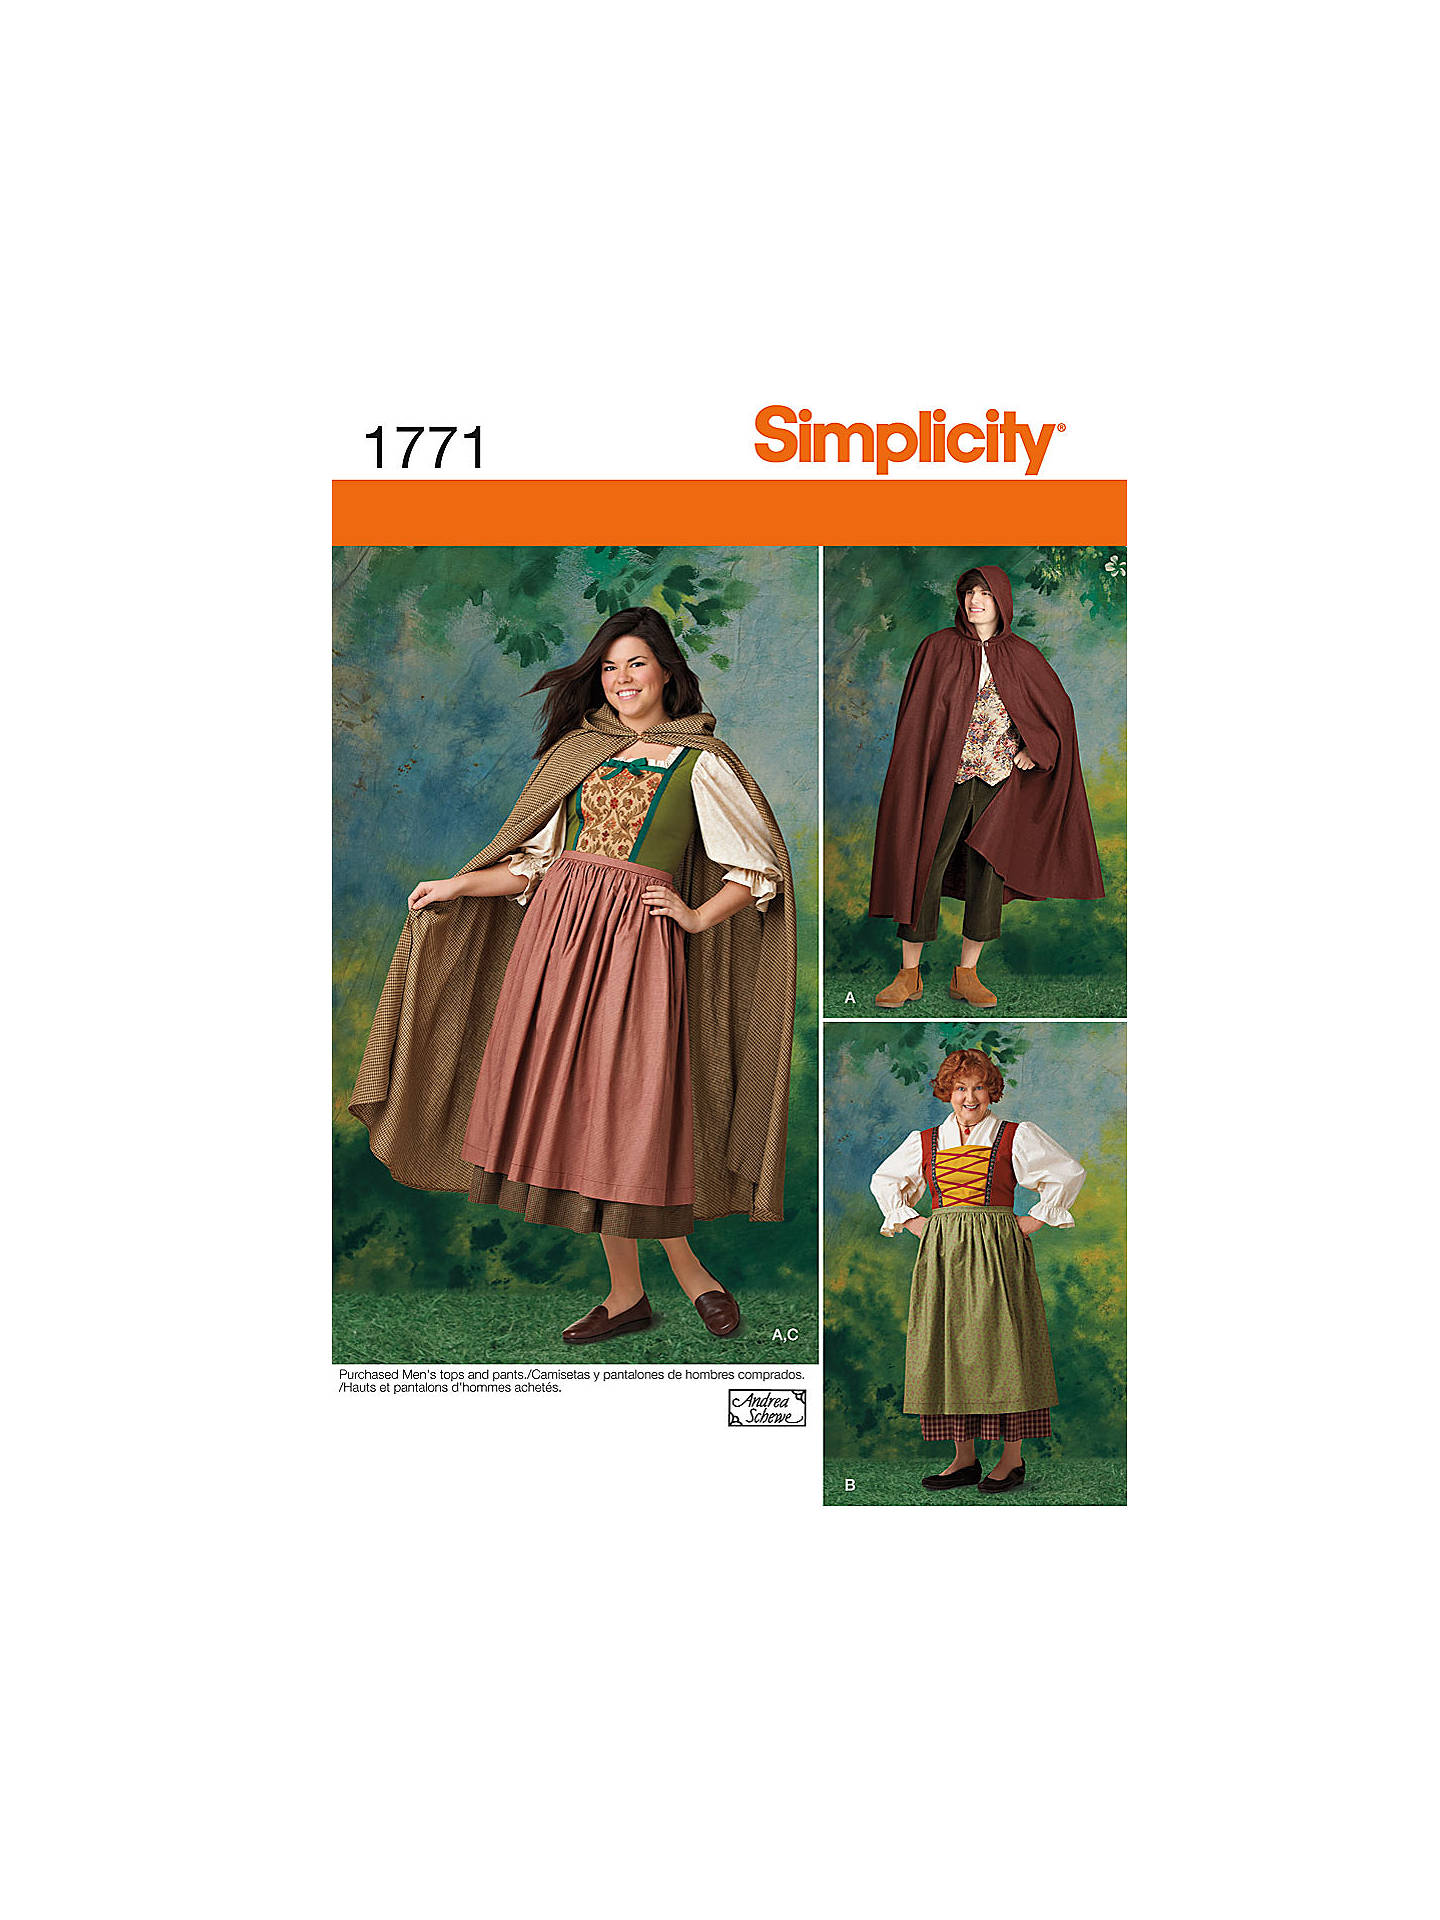 c137959c0aa Buy Simplicity Men   Women s Robin Hood Costume Sewing Pattern